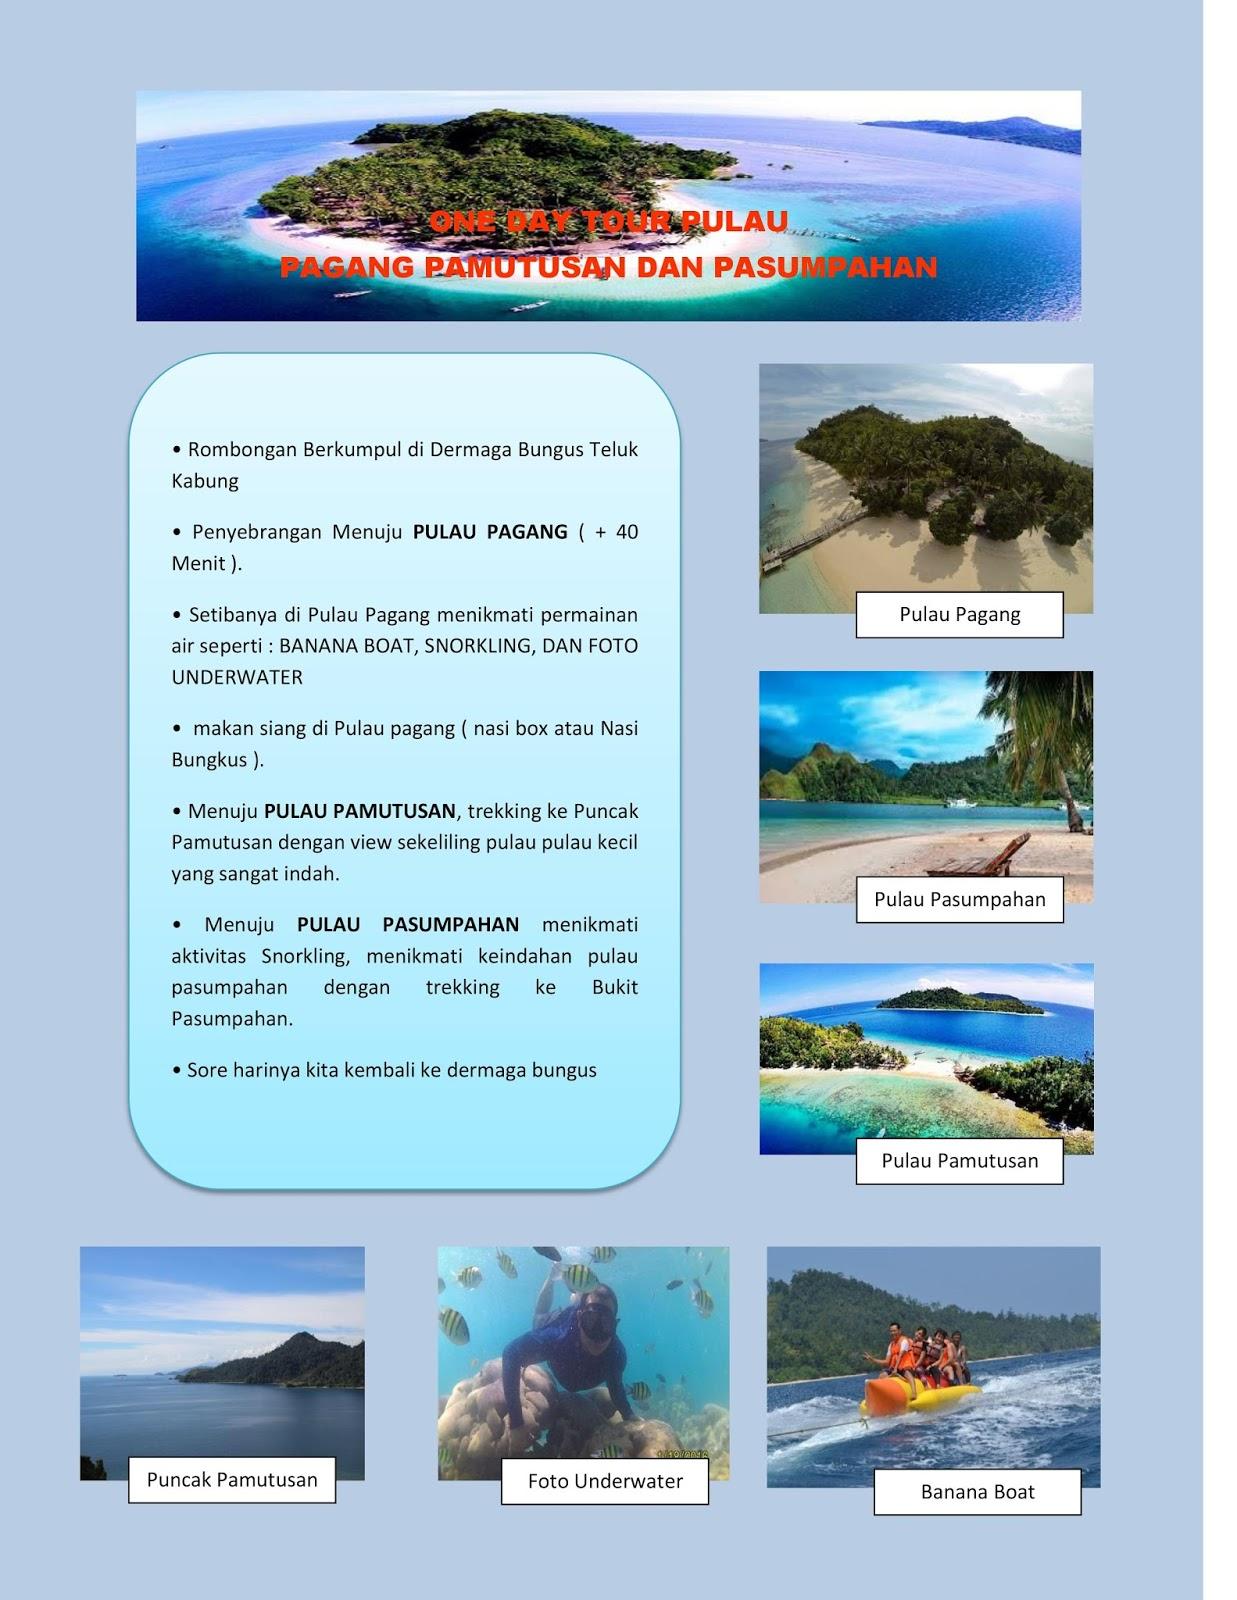 Pulau Swarna Dwipa Padang : pulau, swarna, dwipa, padang, PAKET, JALAN, MURAH, PADANG, BUKITTINGGI:, Paket, Liburan, Pulau